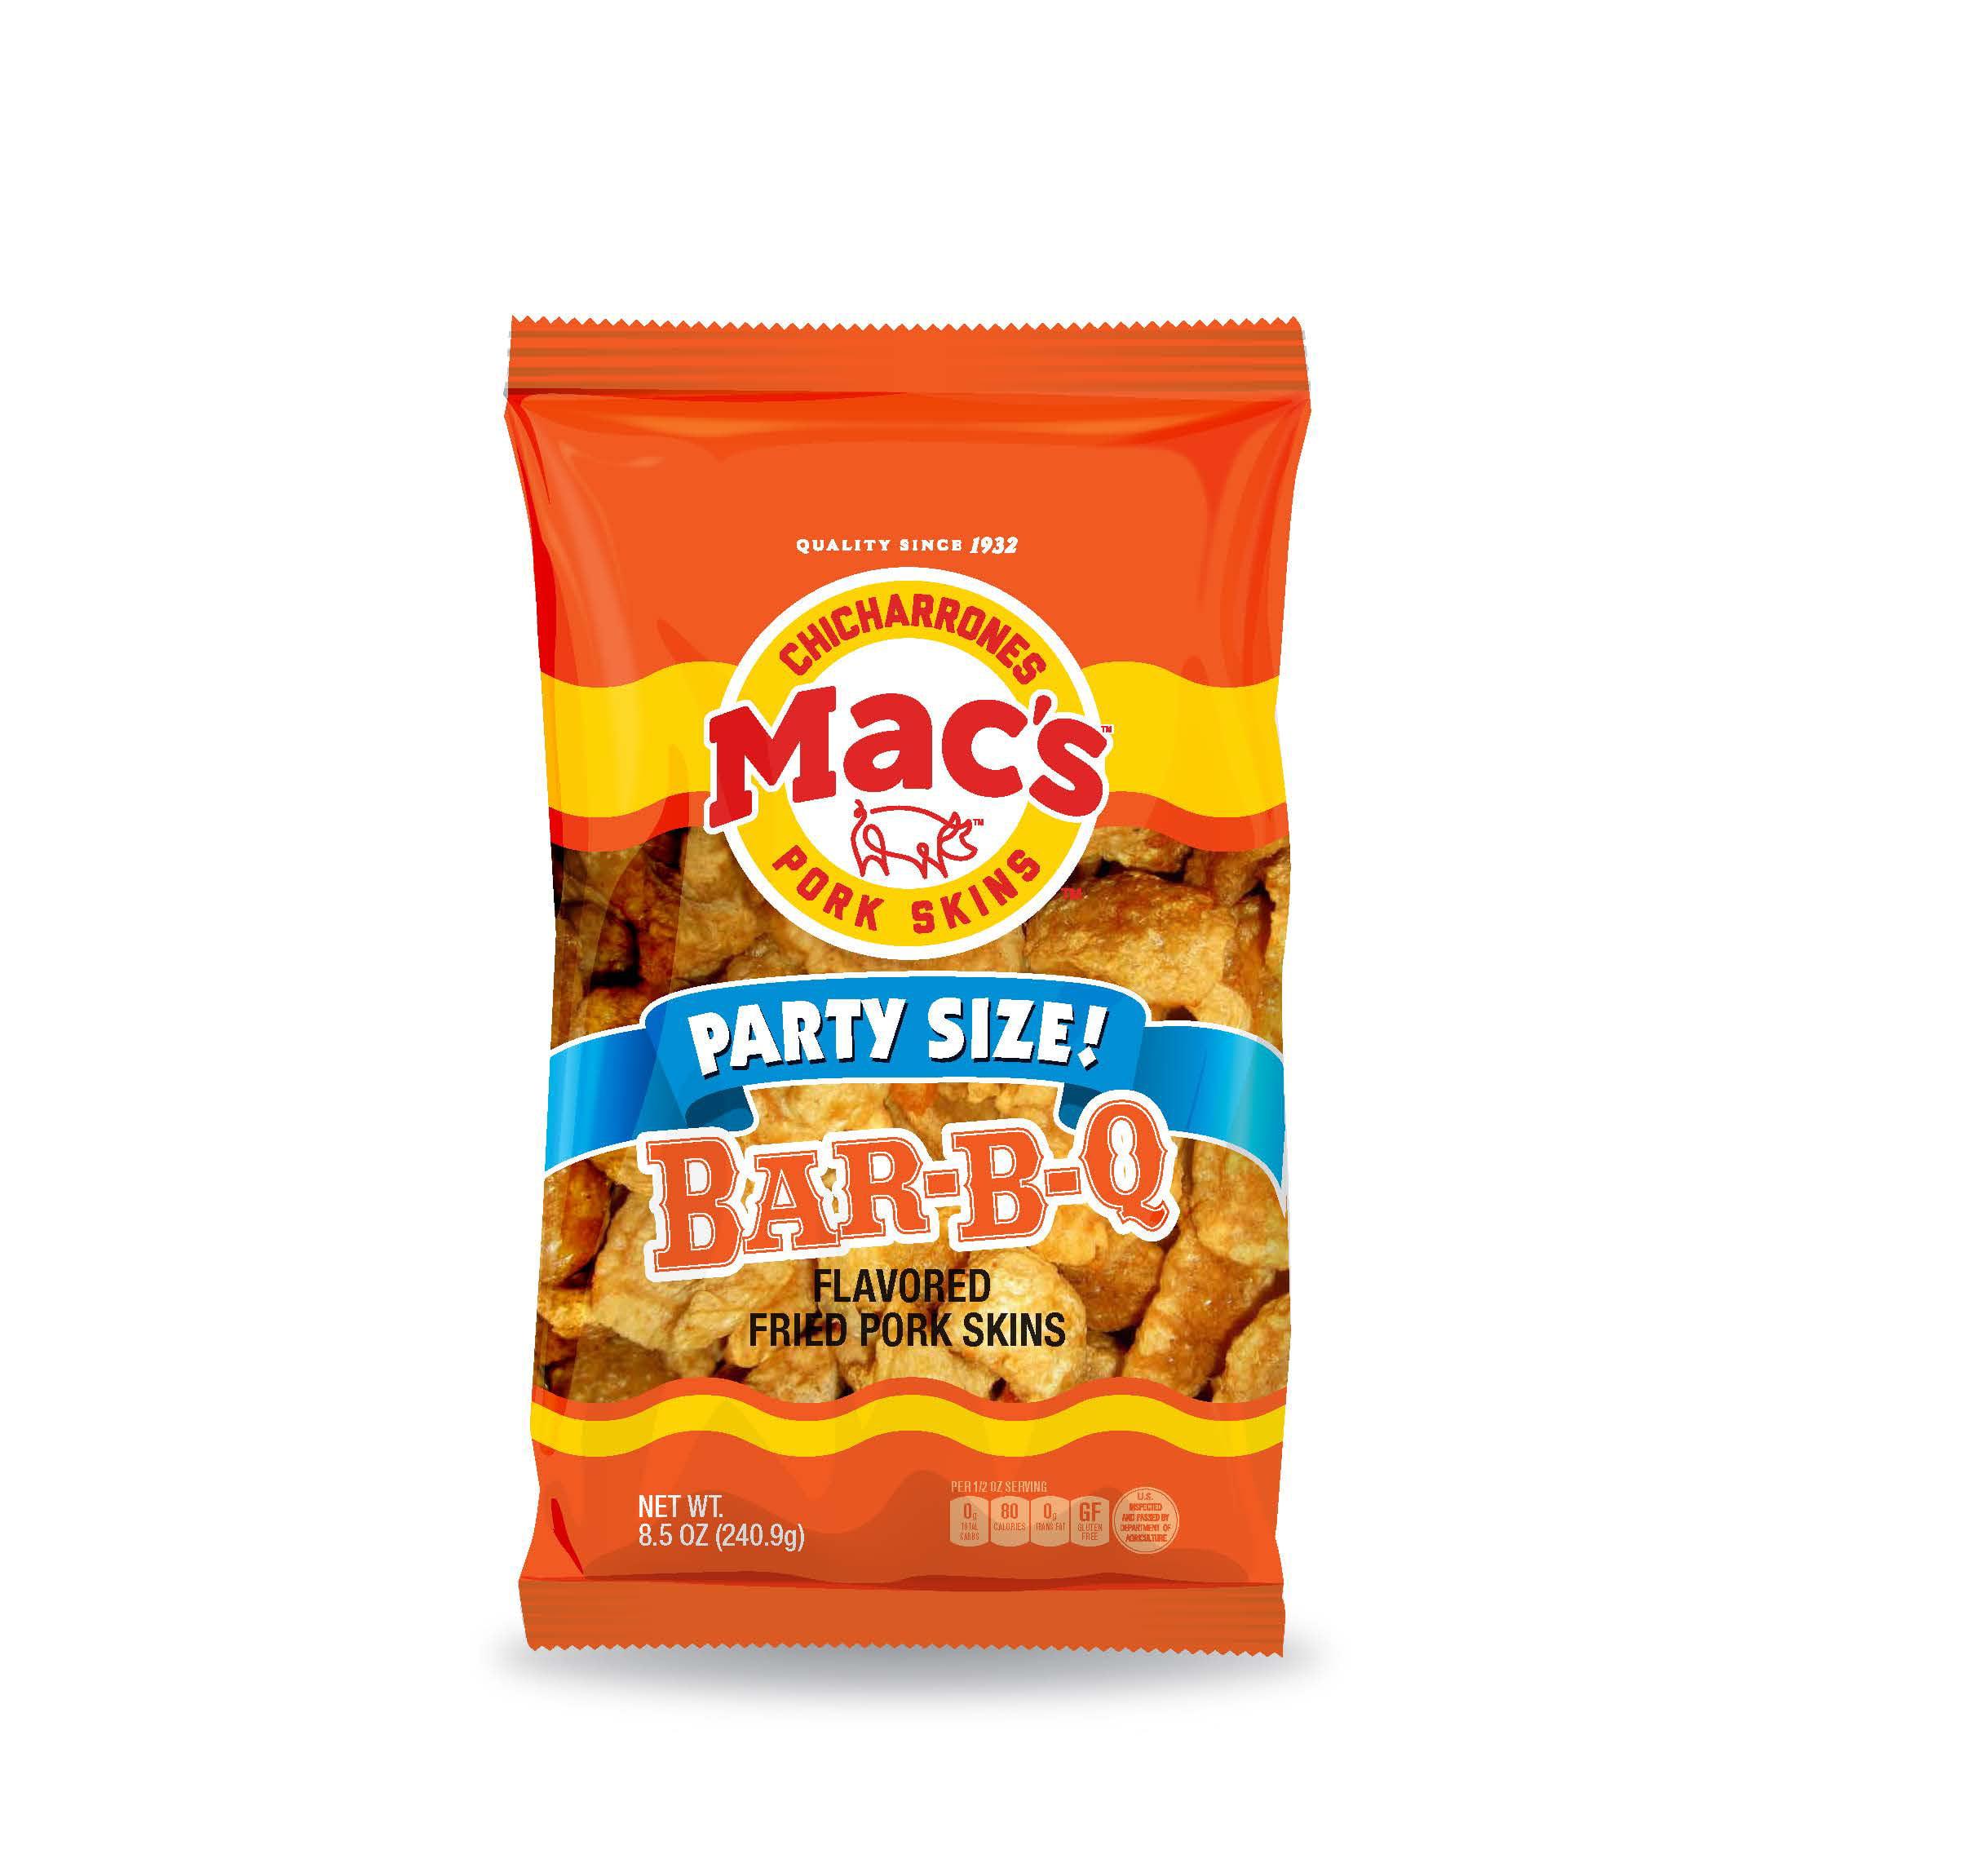 Mac's Bar-B-Q Pork Skins Party Size!, 8.5 Oz.